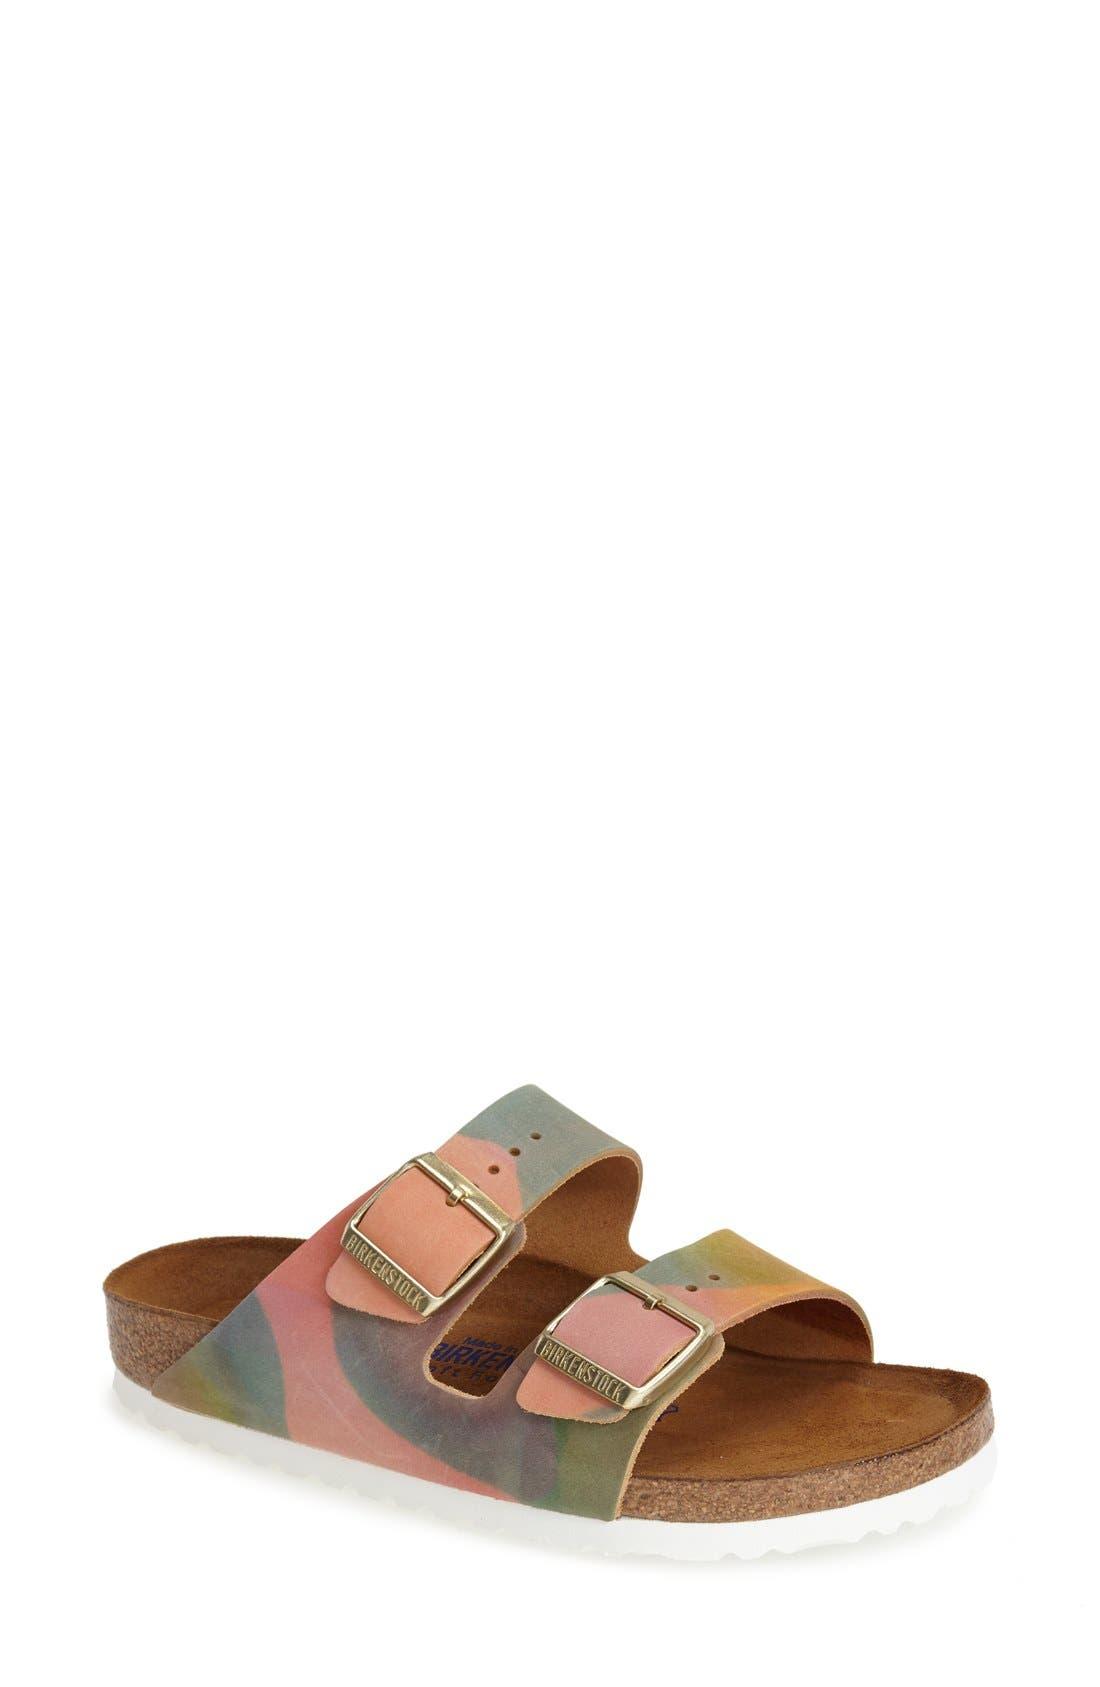 Main Image - Birkenstock 'Arizona' Nubuck Leather Sandal (Women)